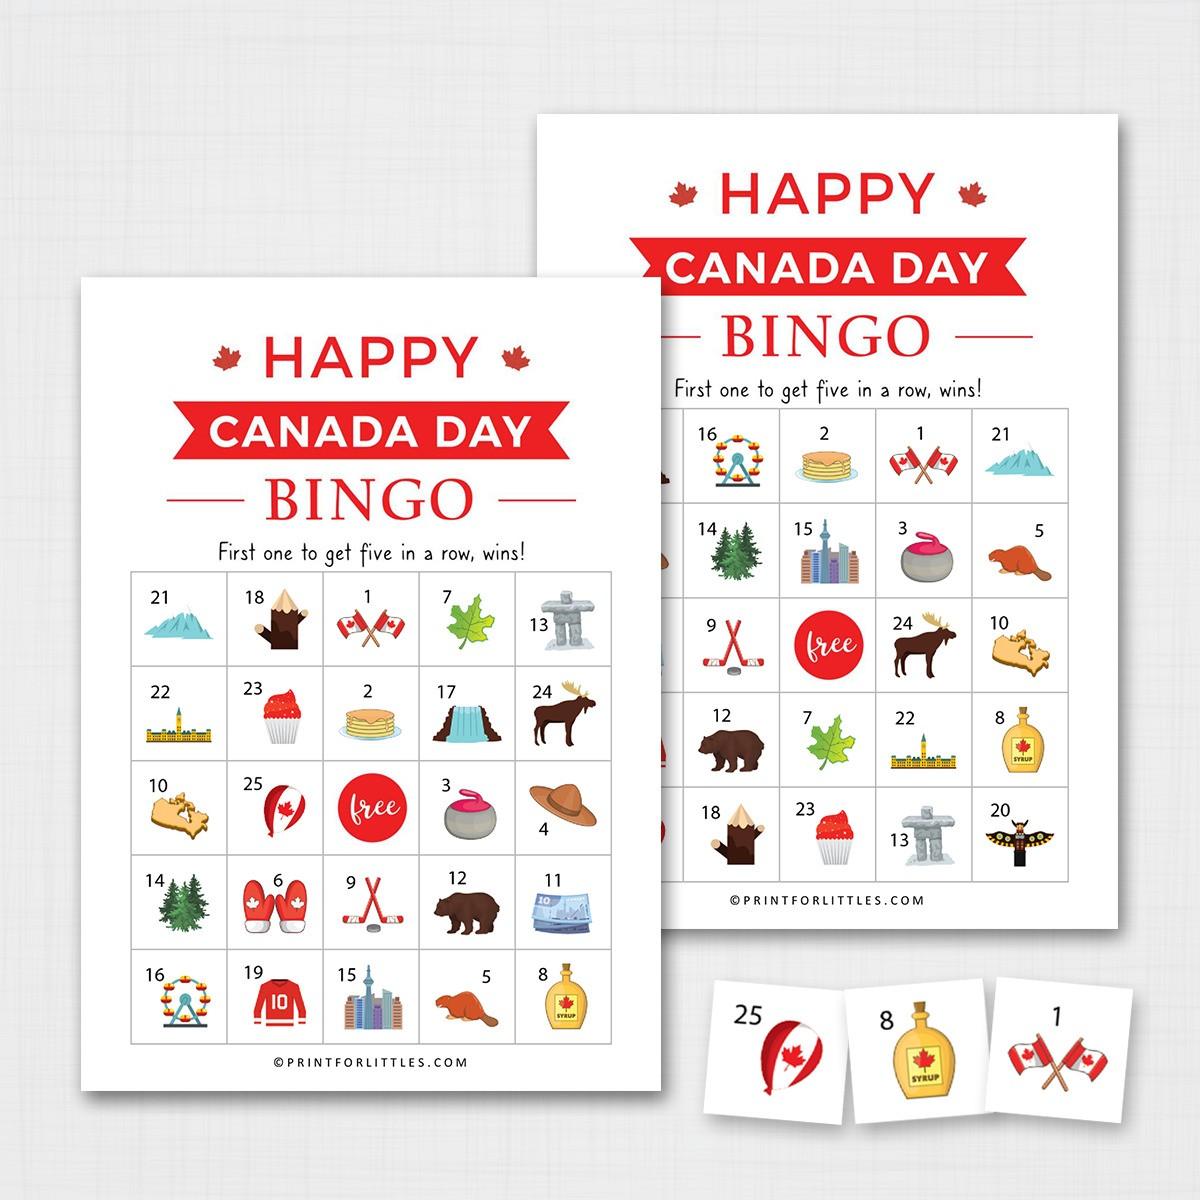 Canada Day Bingo Game Printable